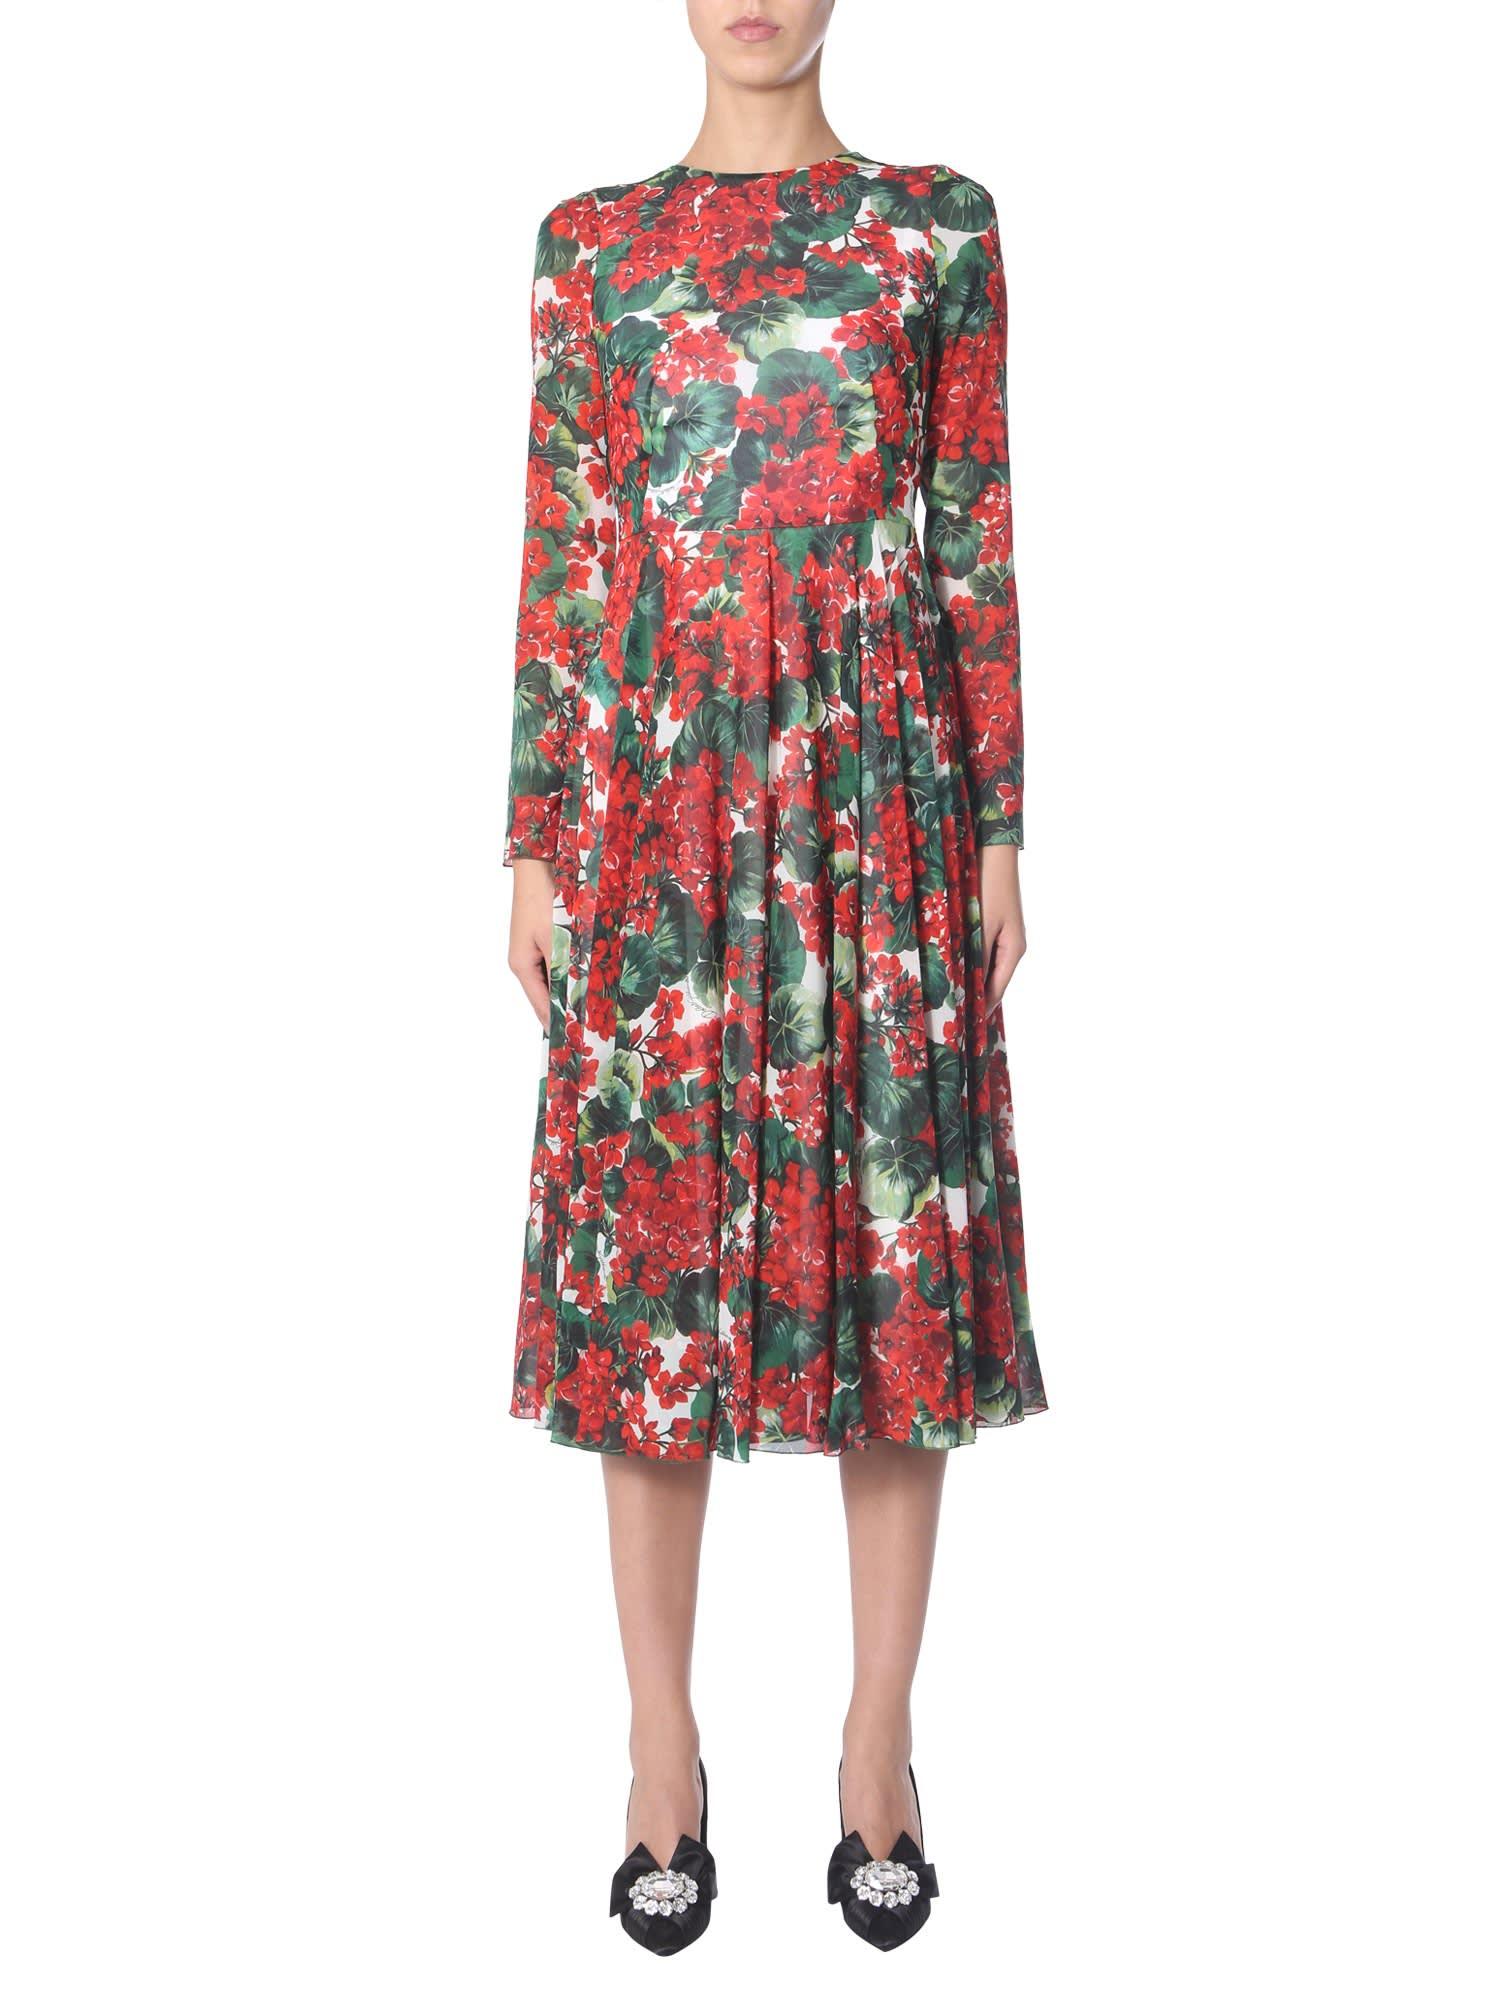 Dolce & Gabbana Dress With Portofino Print